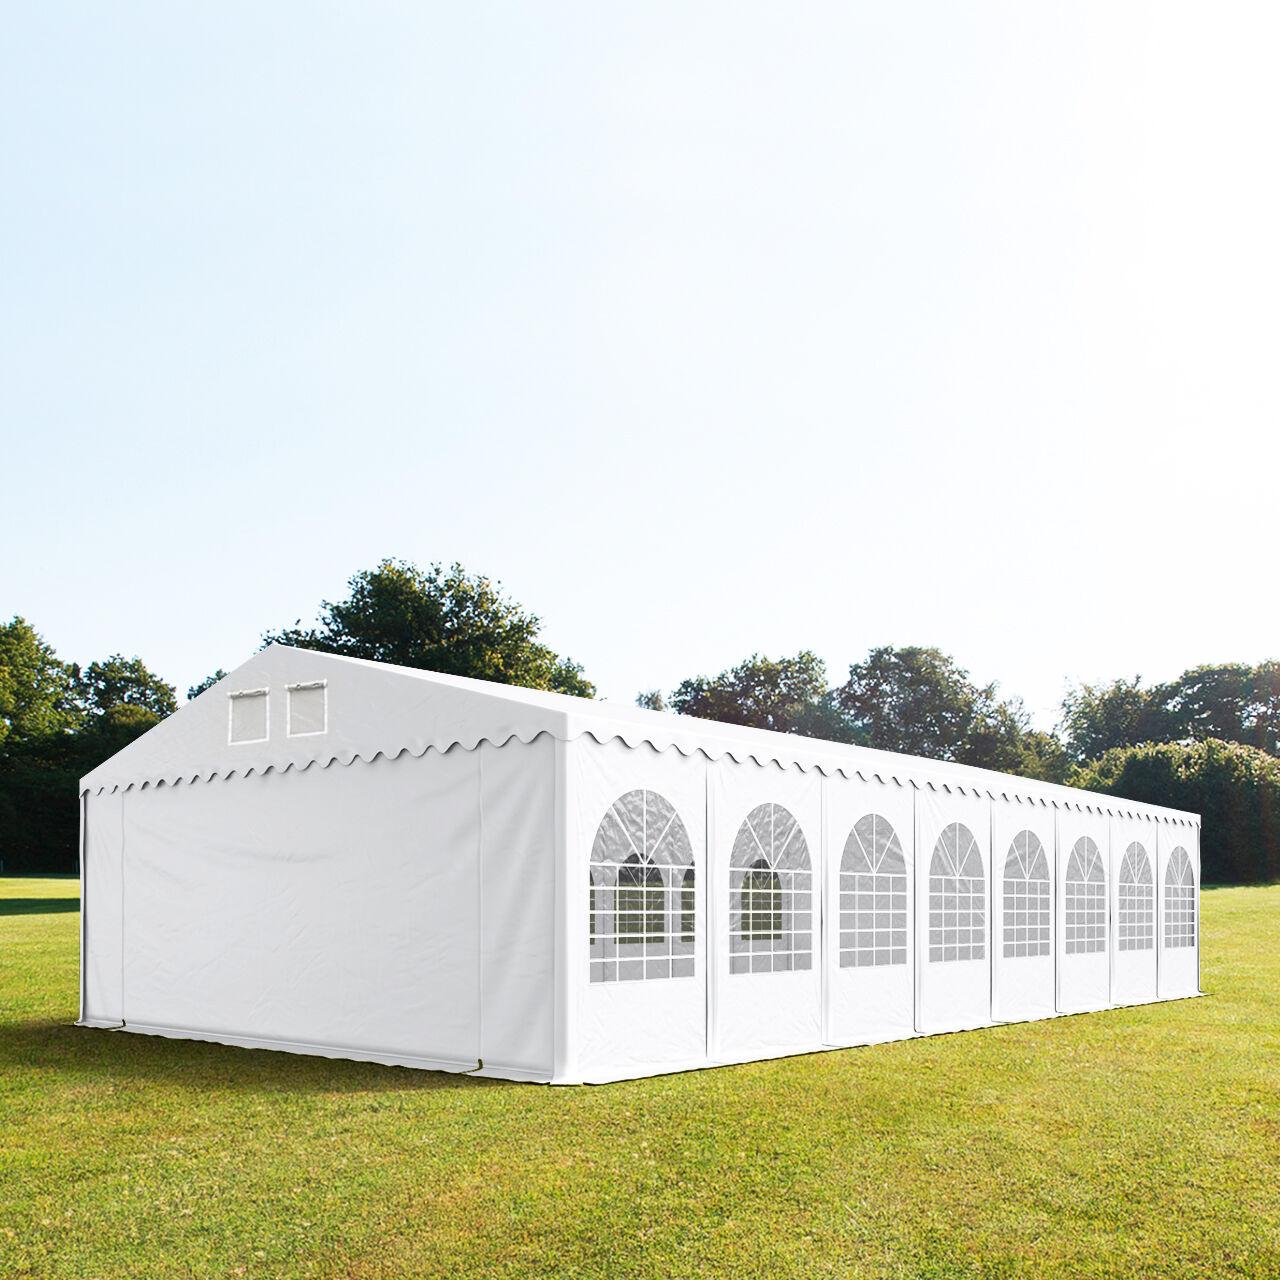 Toolport Tendone per Feste 8x20m PVC 550 g/m² bianco impermeabile